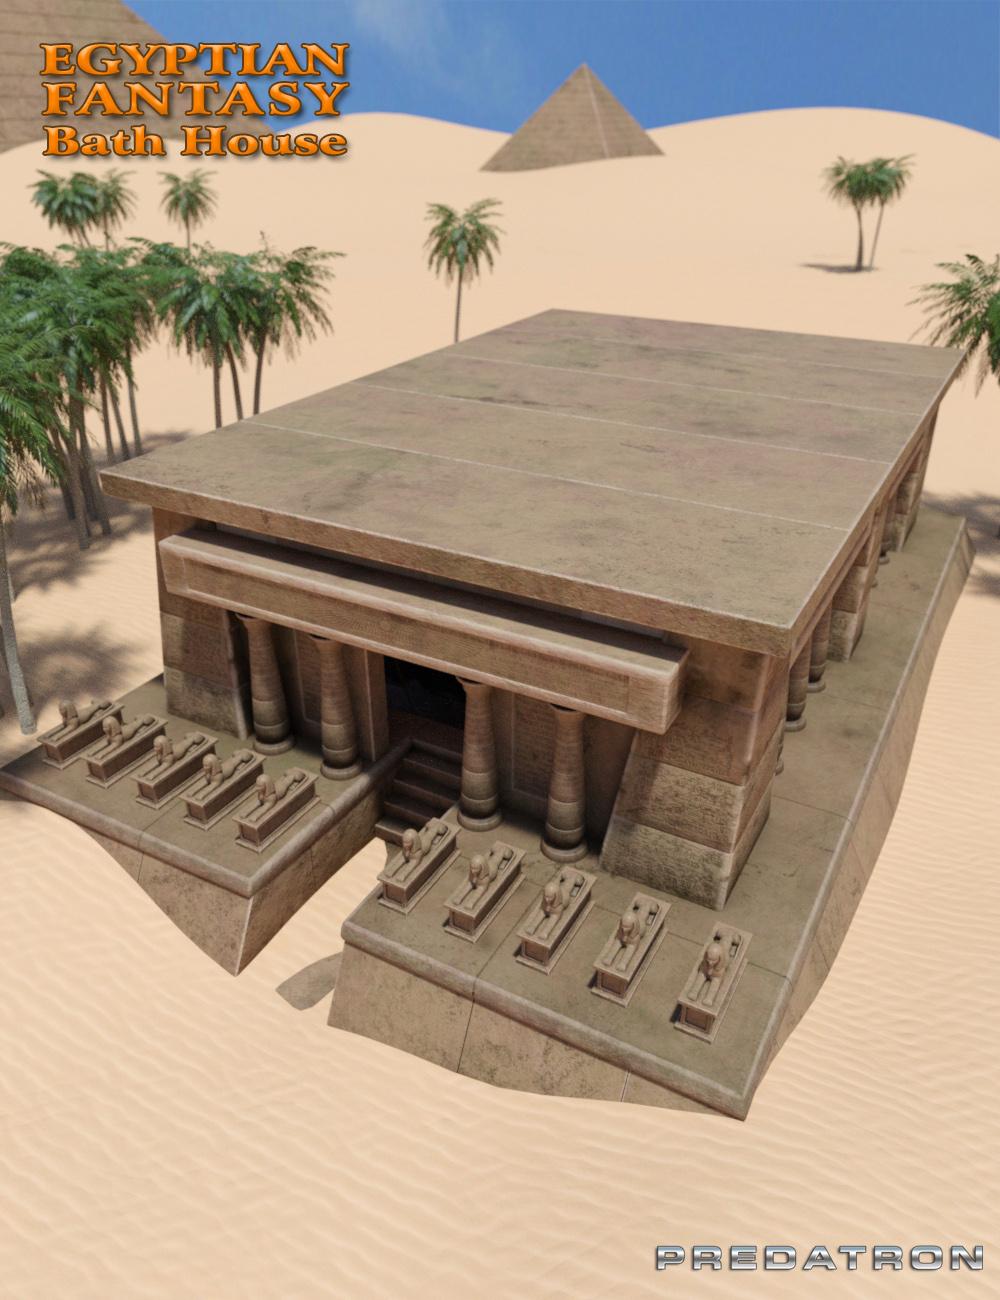 Egyptian Fantasy Bath House by: Predatron, 3D Models by Daz 3D